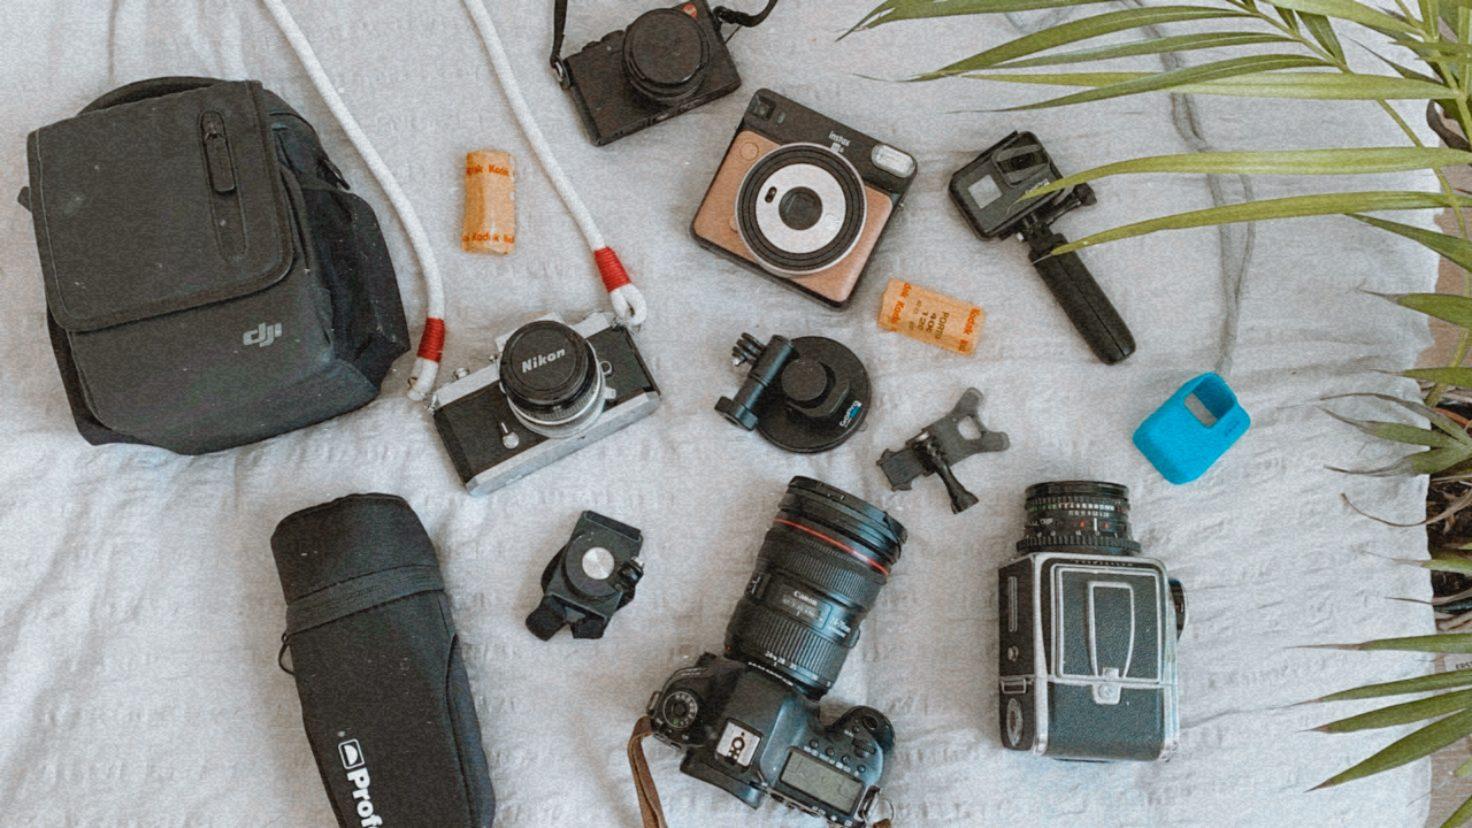 My Photography Kit 2020